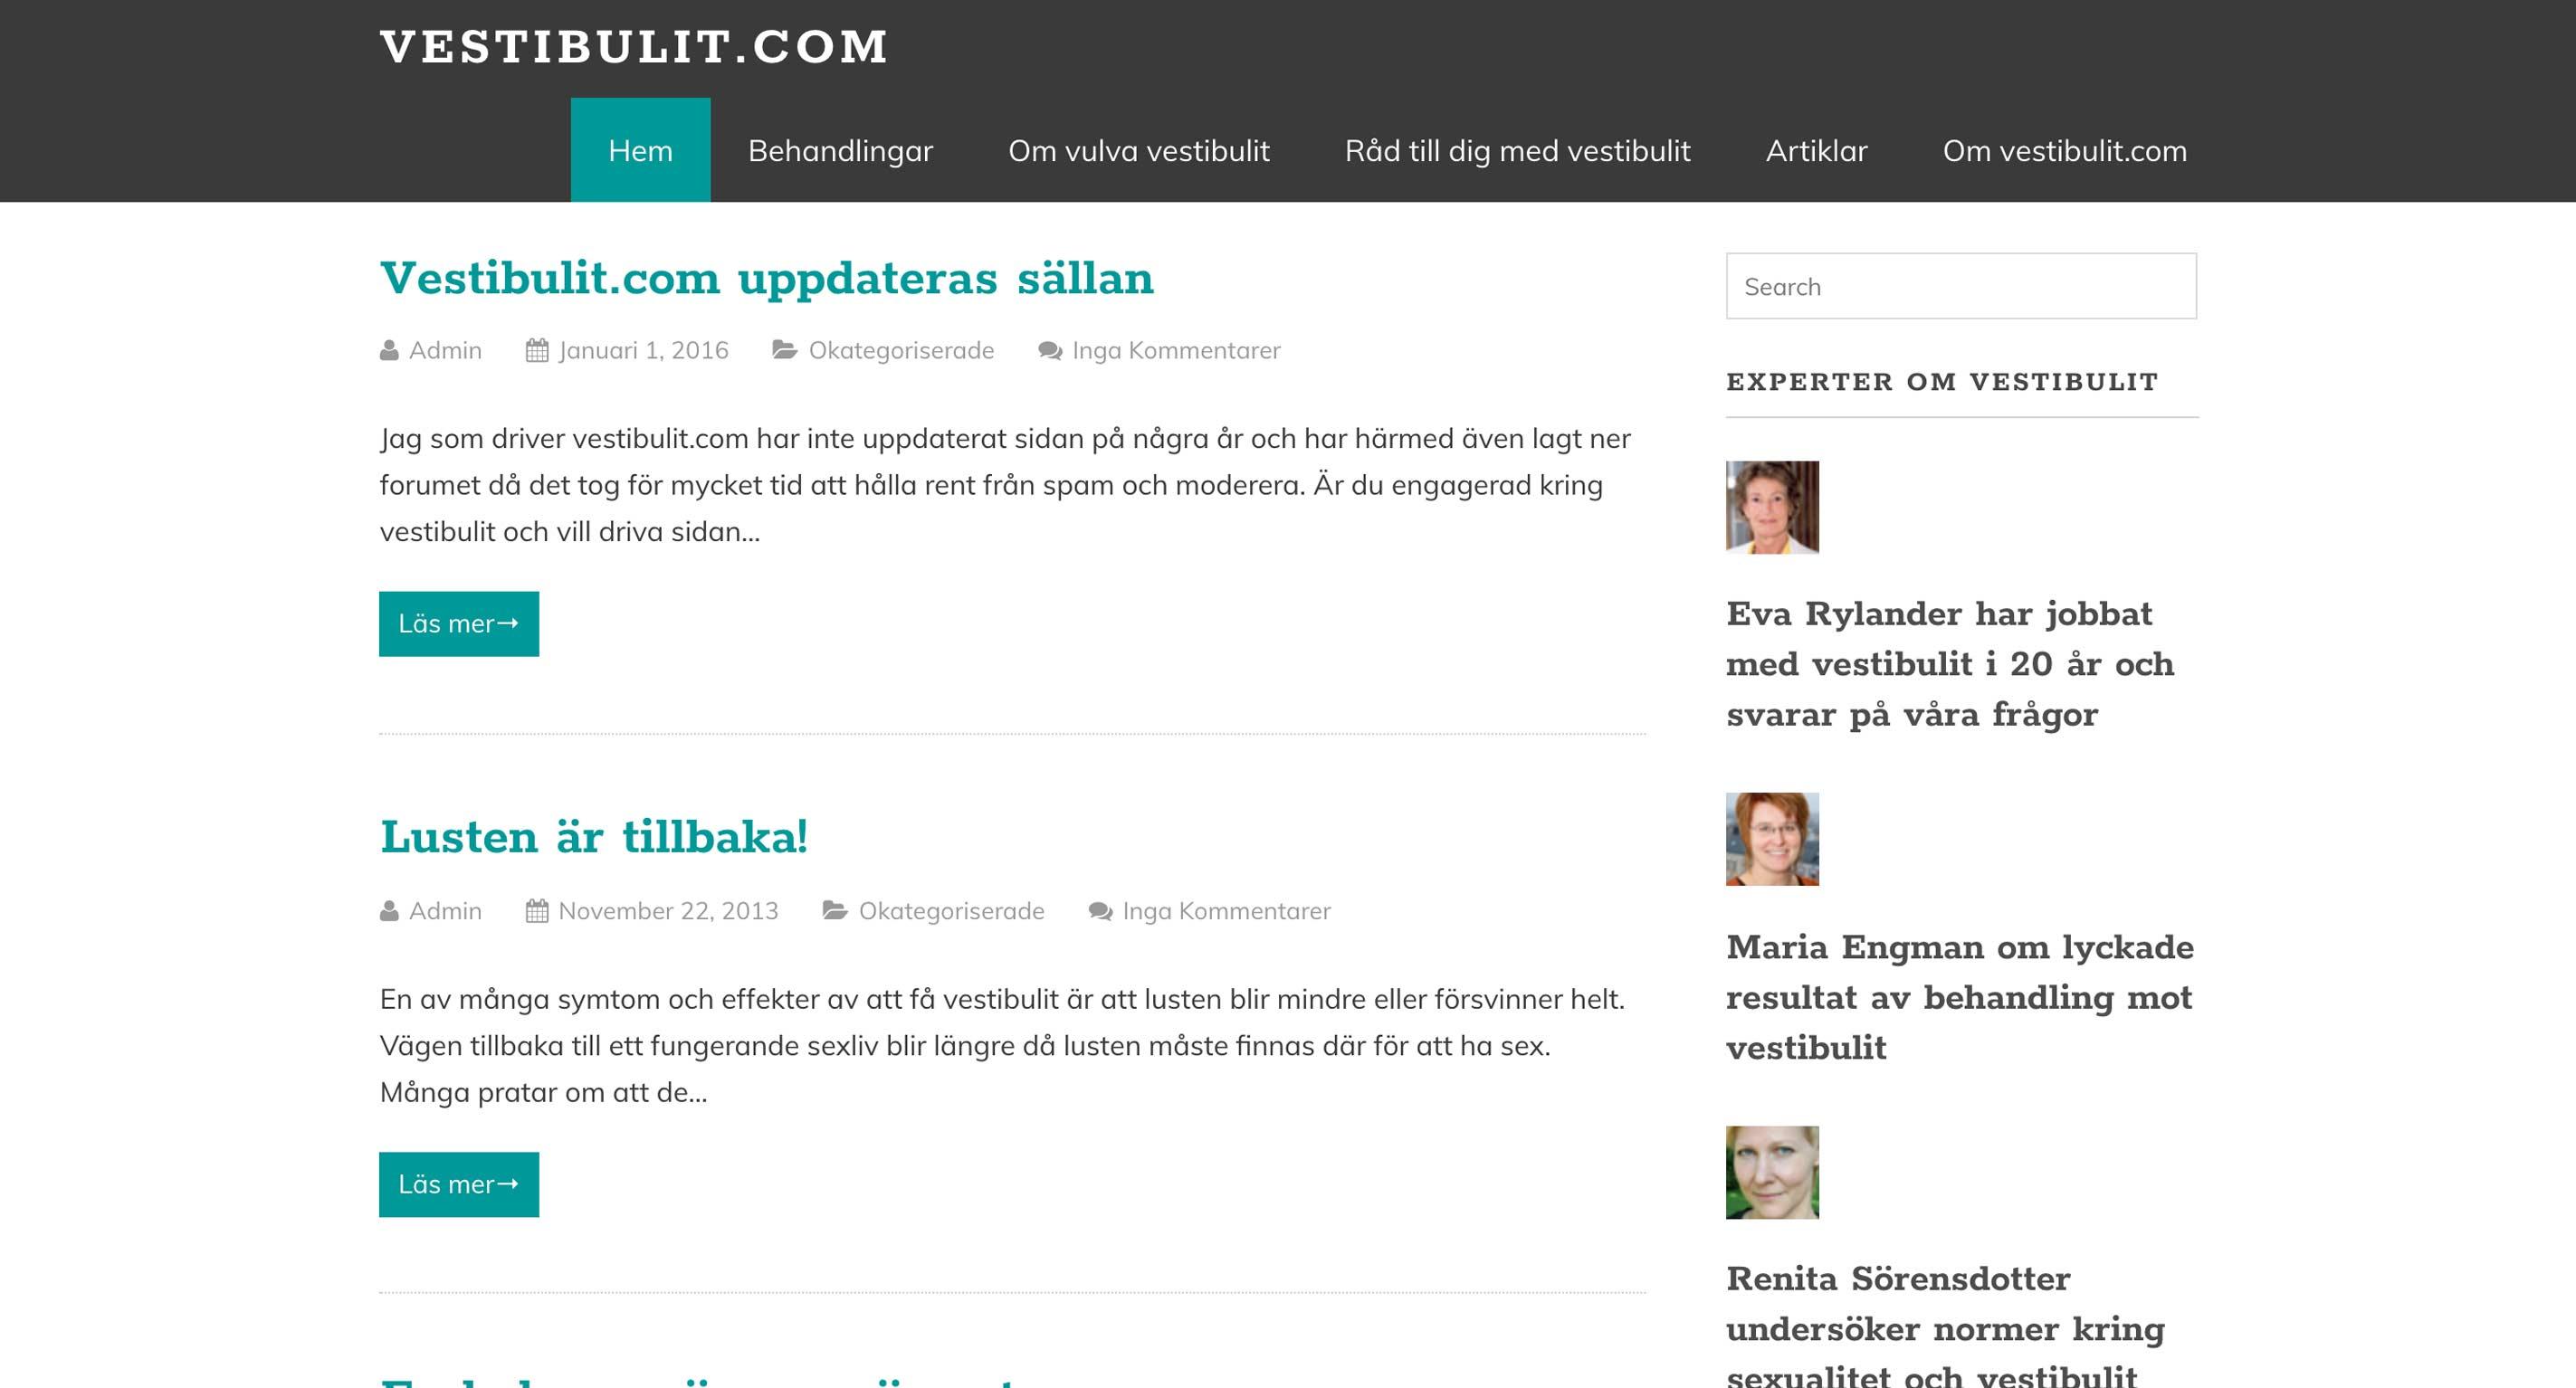 Vestibulit - Home Page